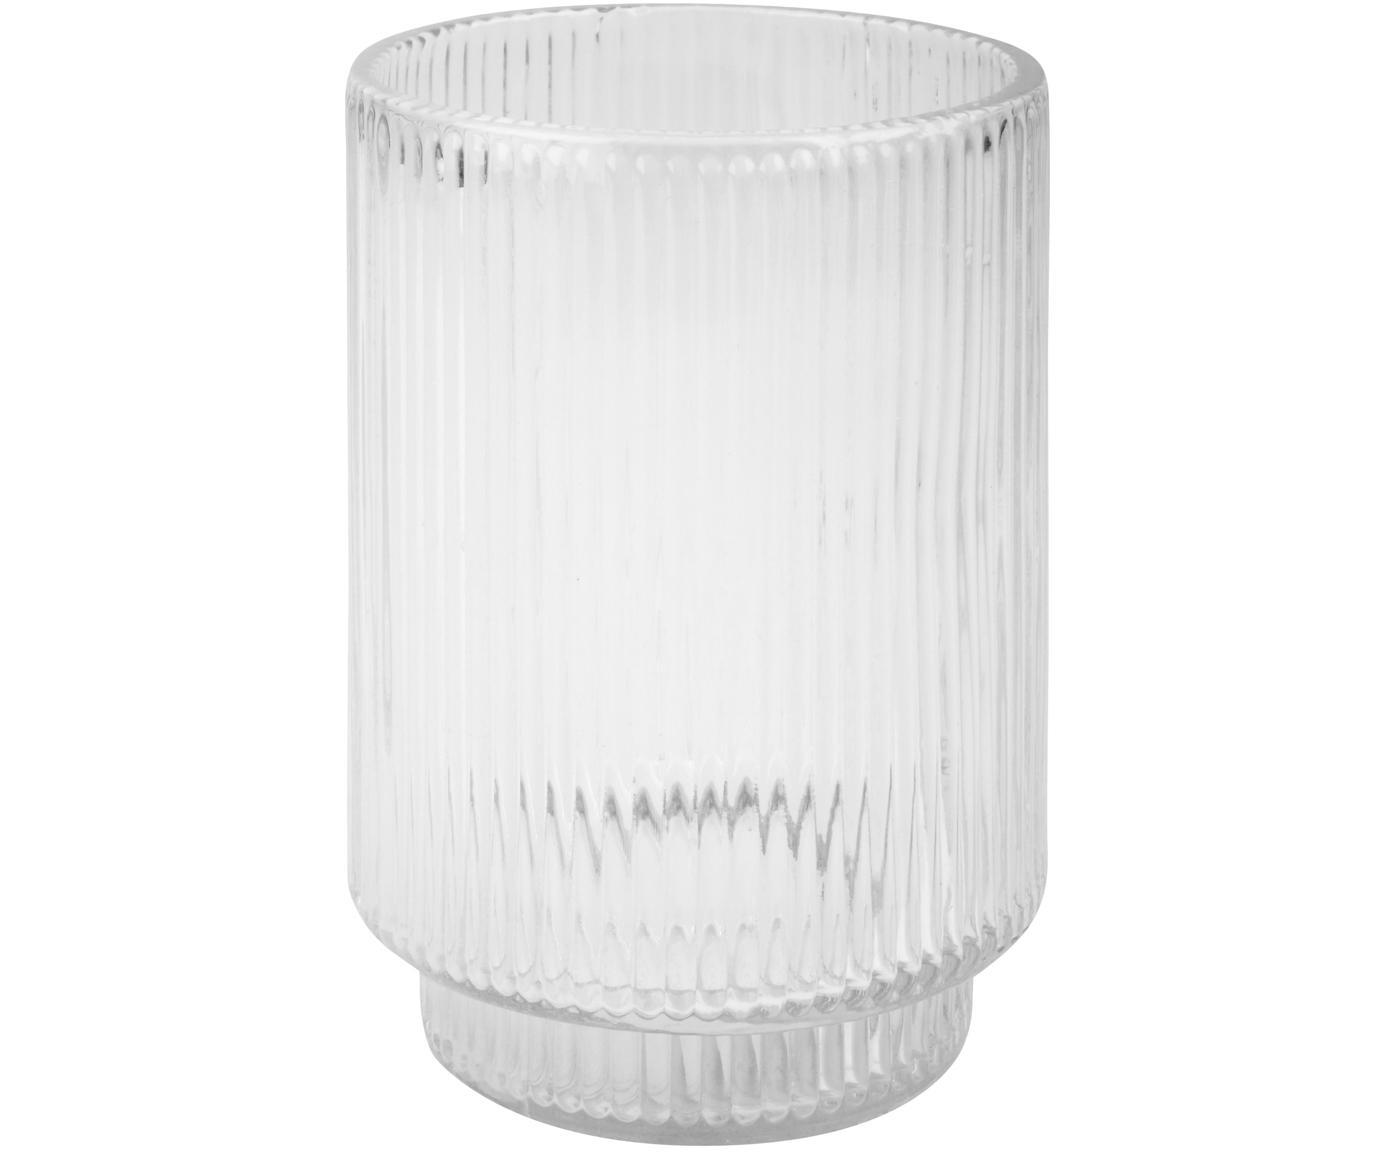 Tandenborstelbeker Ligia van geribbeld glas, Glas, Transparant, Ø 7 x H 10 cm